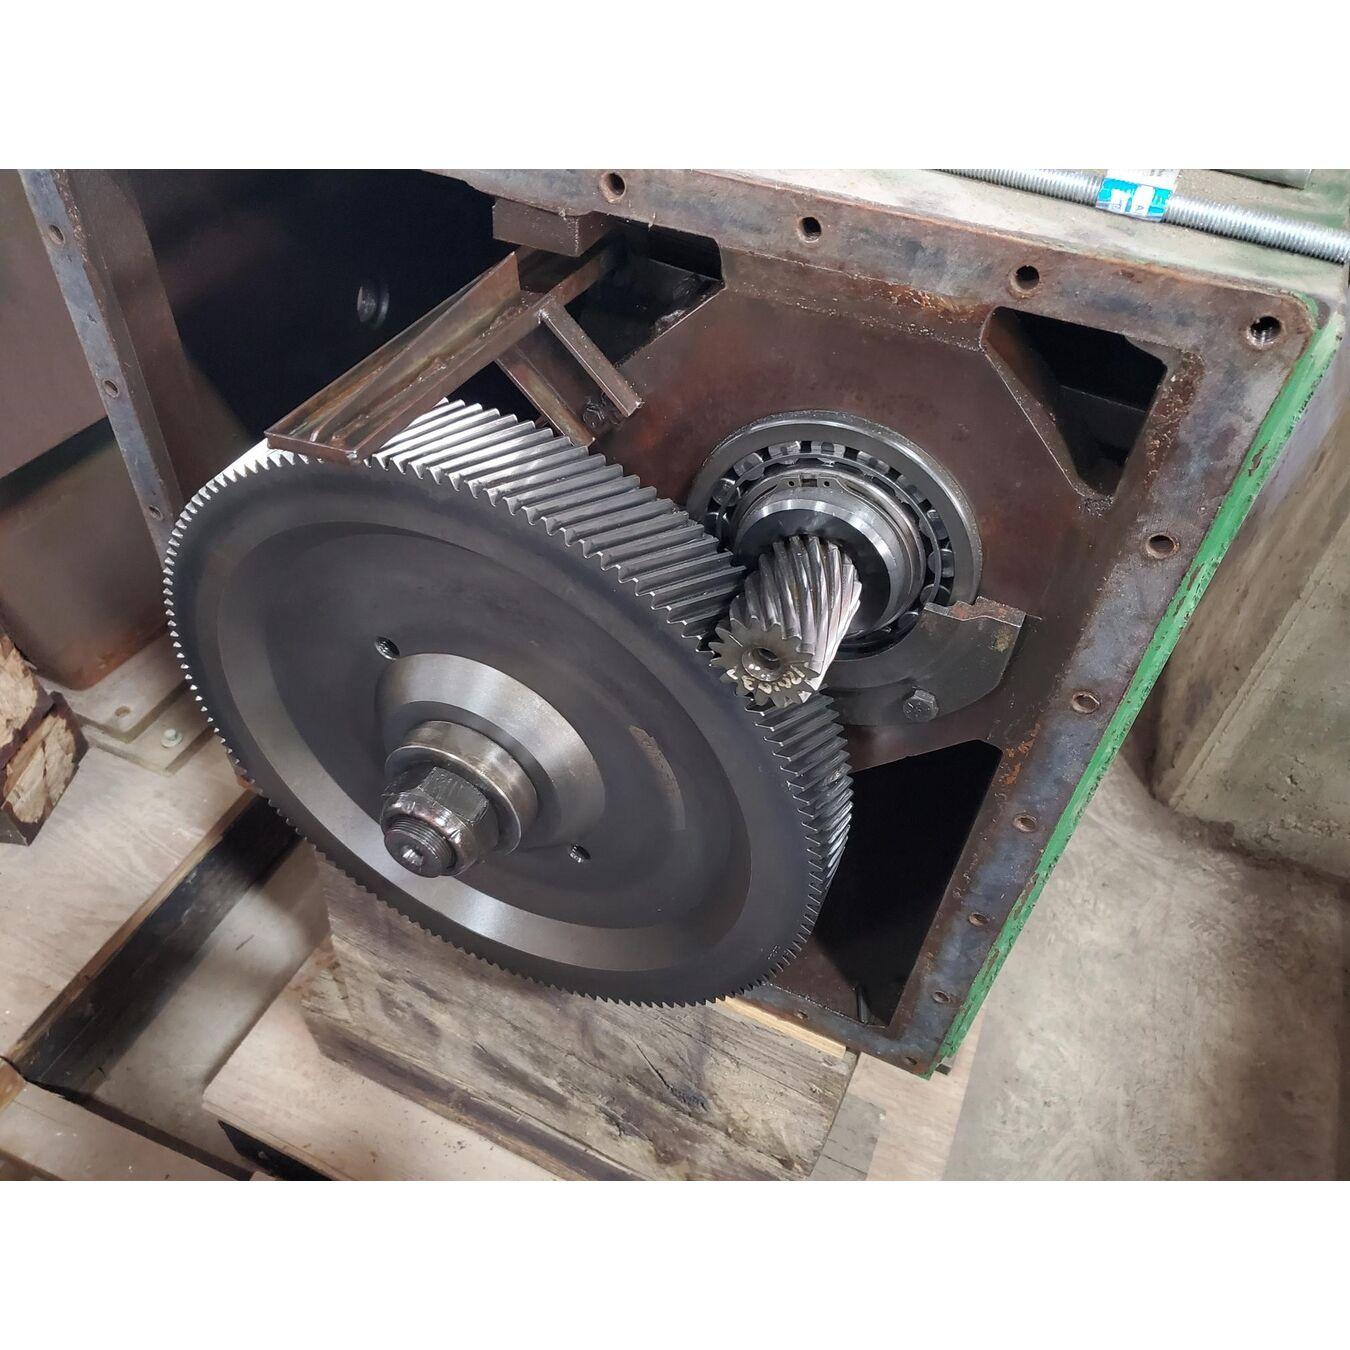 Used 75 Hp Lightnin Mixer Agitator Drive Model Lat 150 For